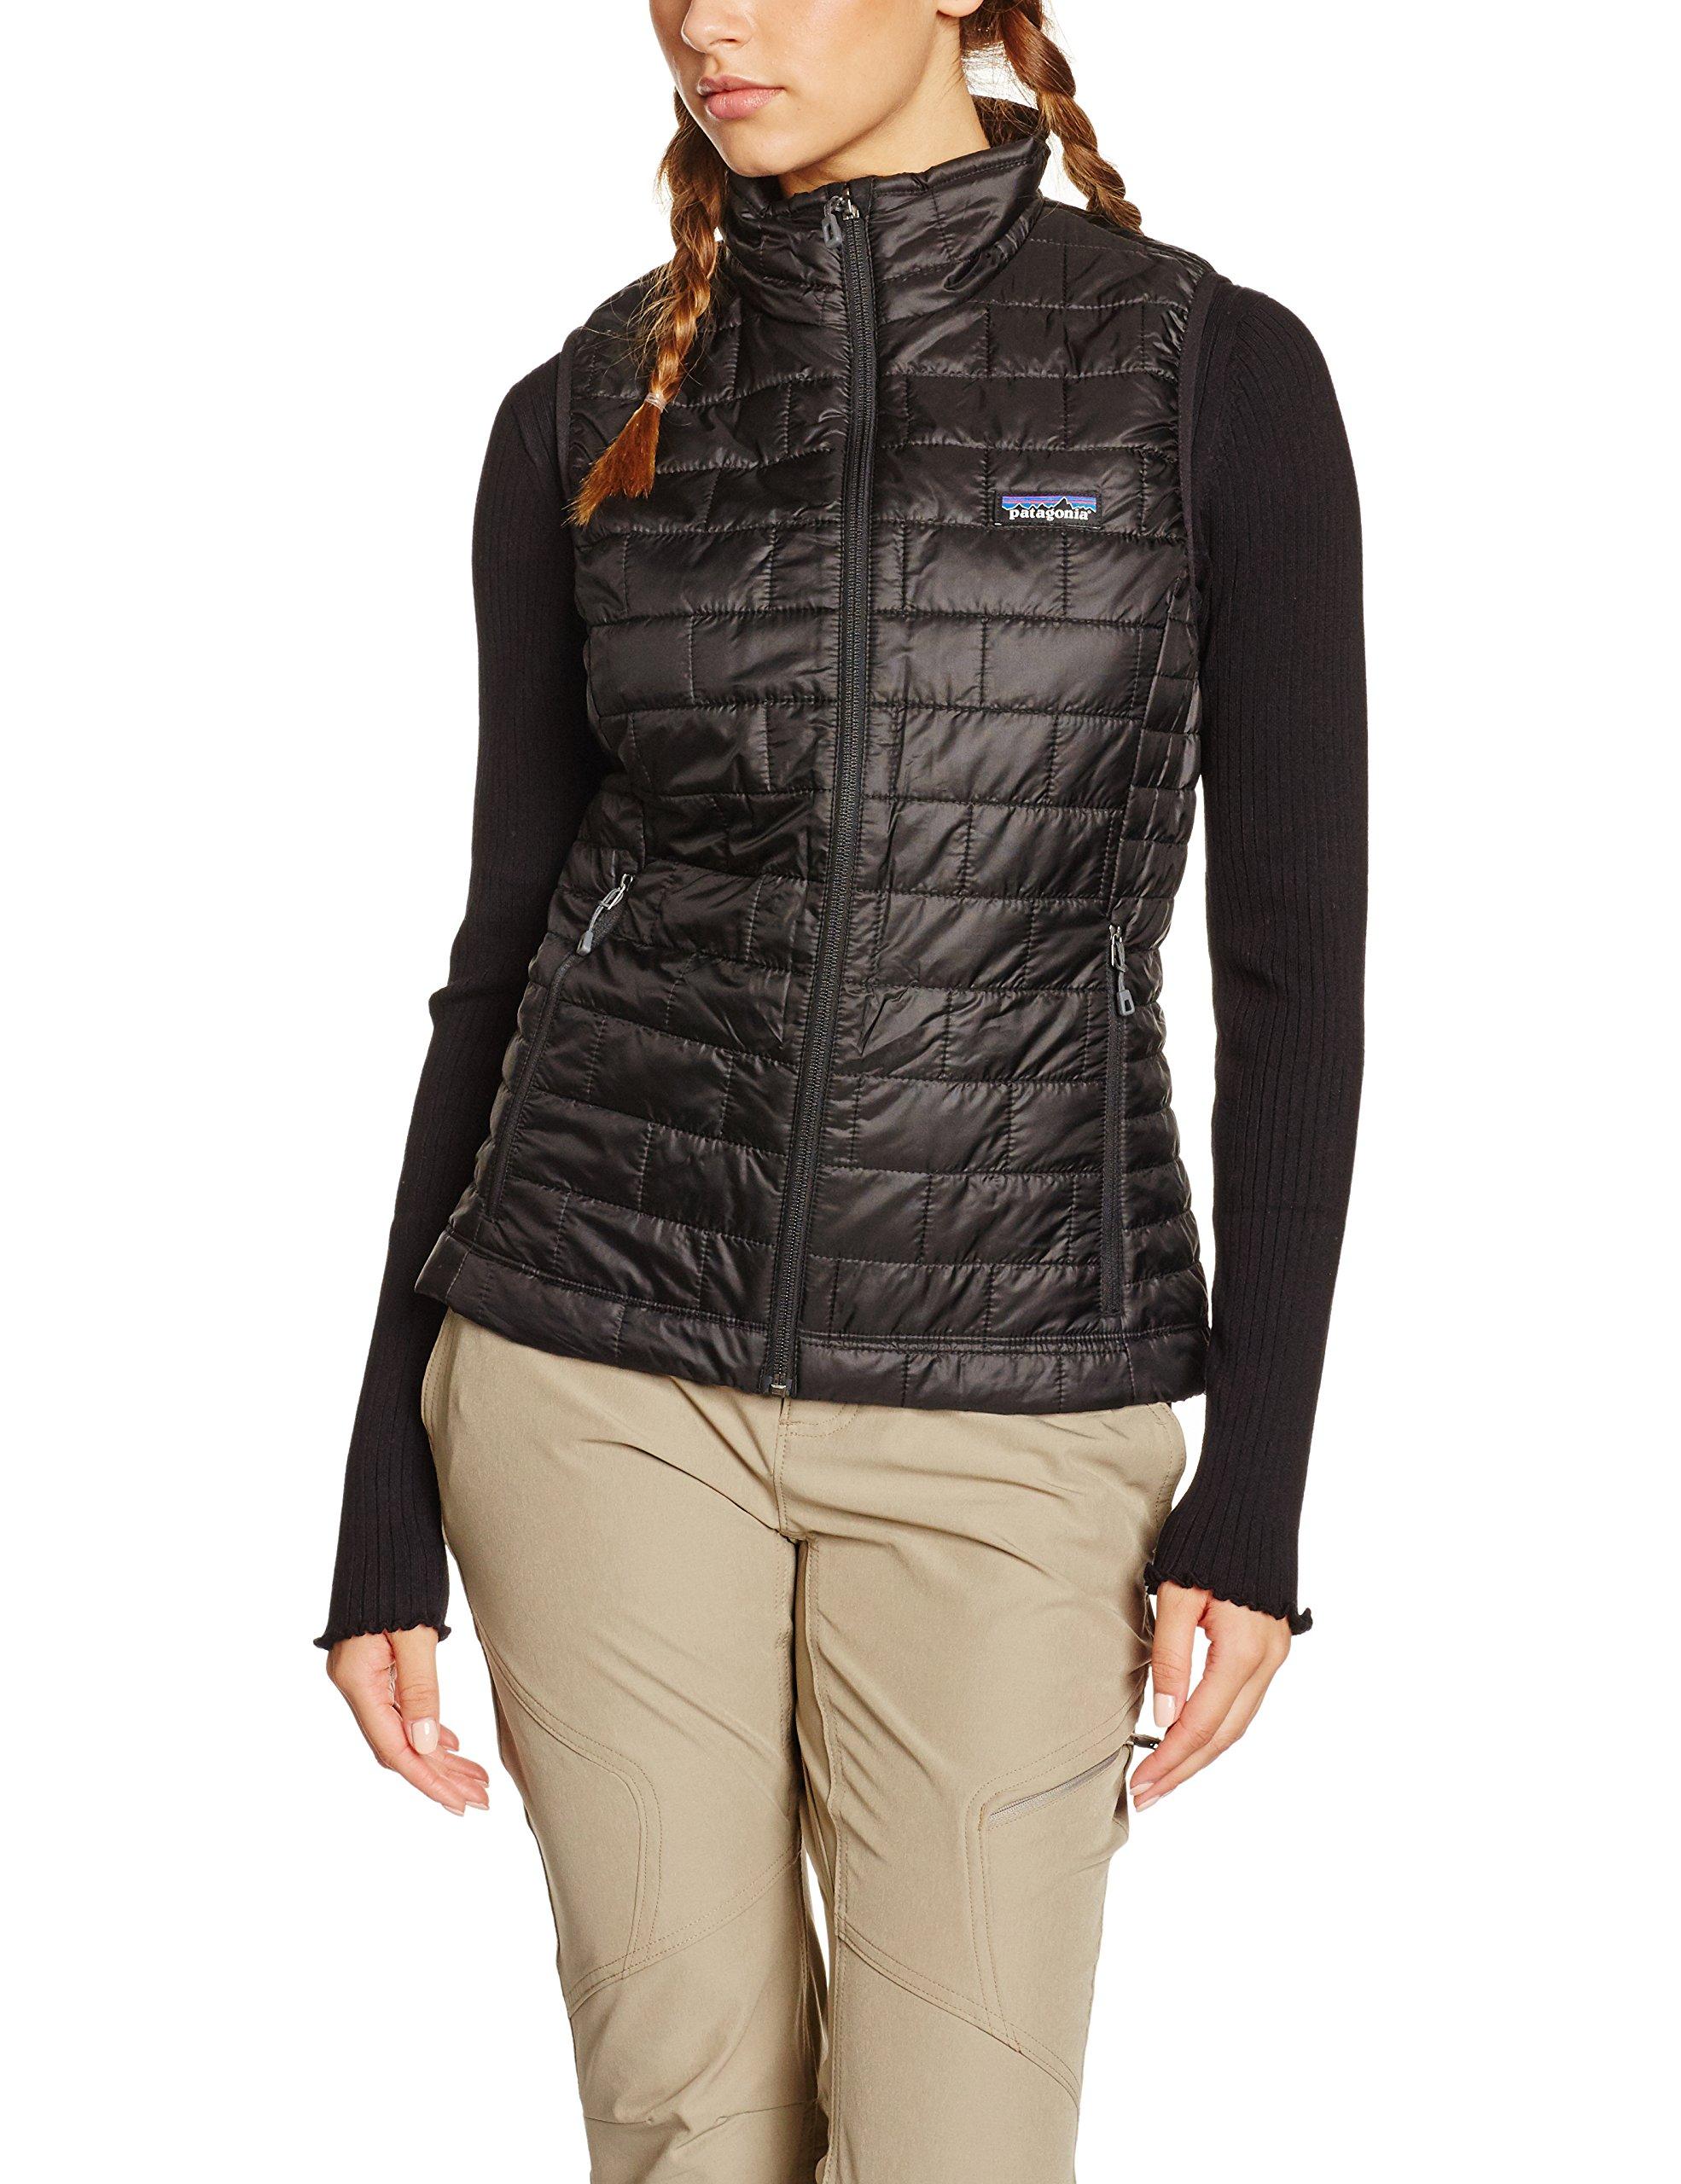 Patagonia Womens Nano Puff Vest - Black (BLK) (M) by Patagonia